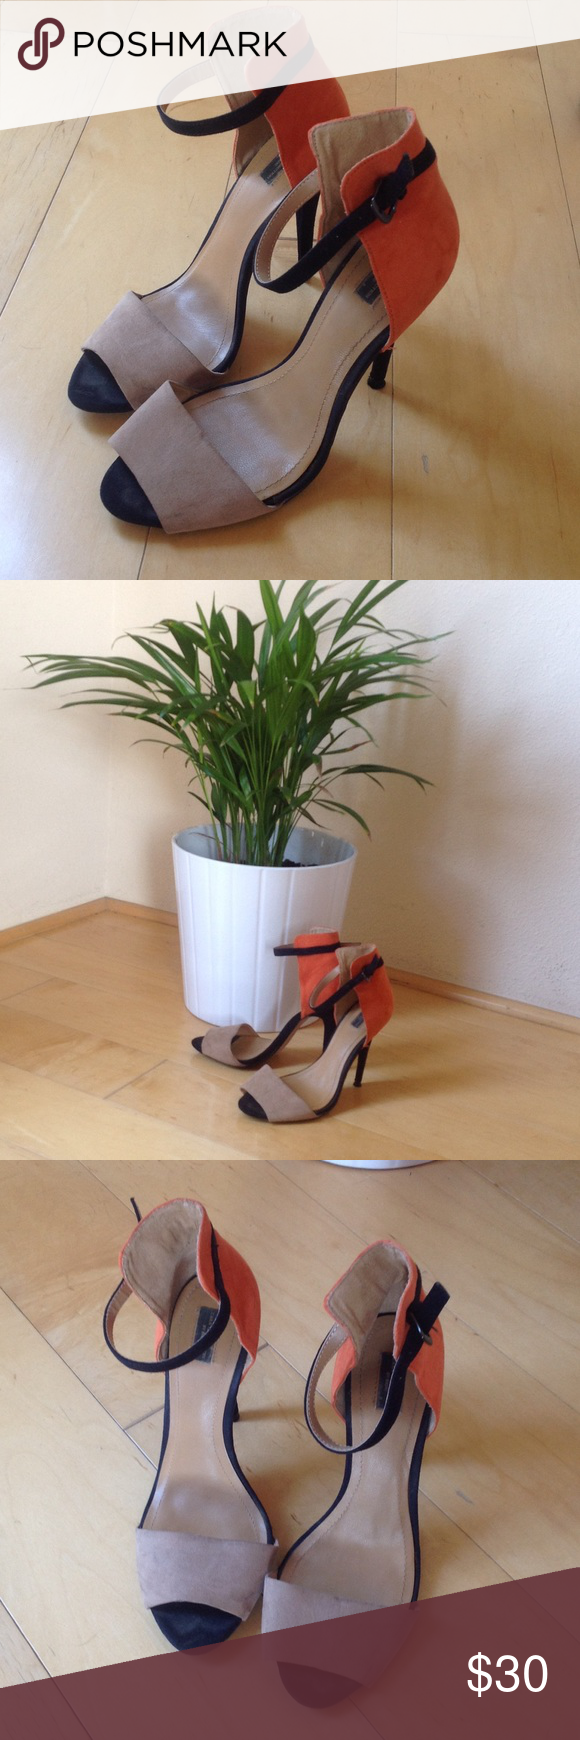 "Elegant colour block high-heel sandals. Elegant beige and orange sandals. 4"" heel in size 7.5. Worn 5 times. Zara Shoes Heels"